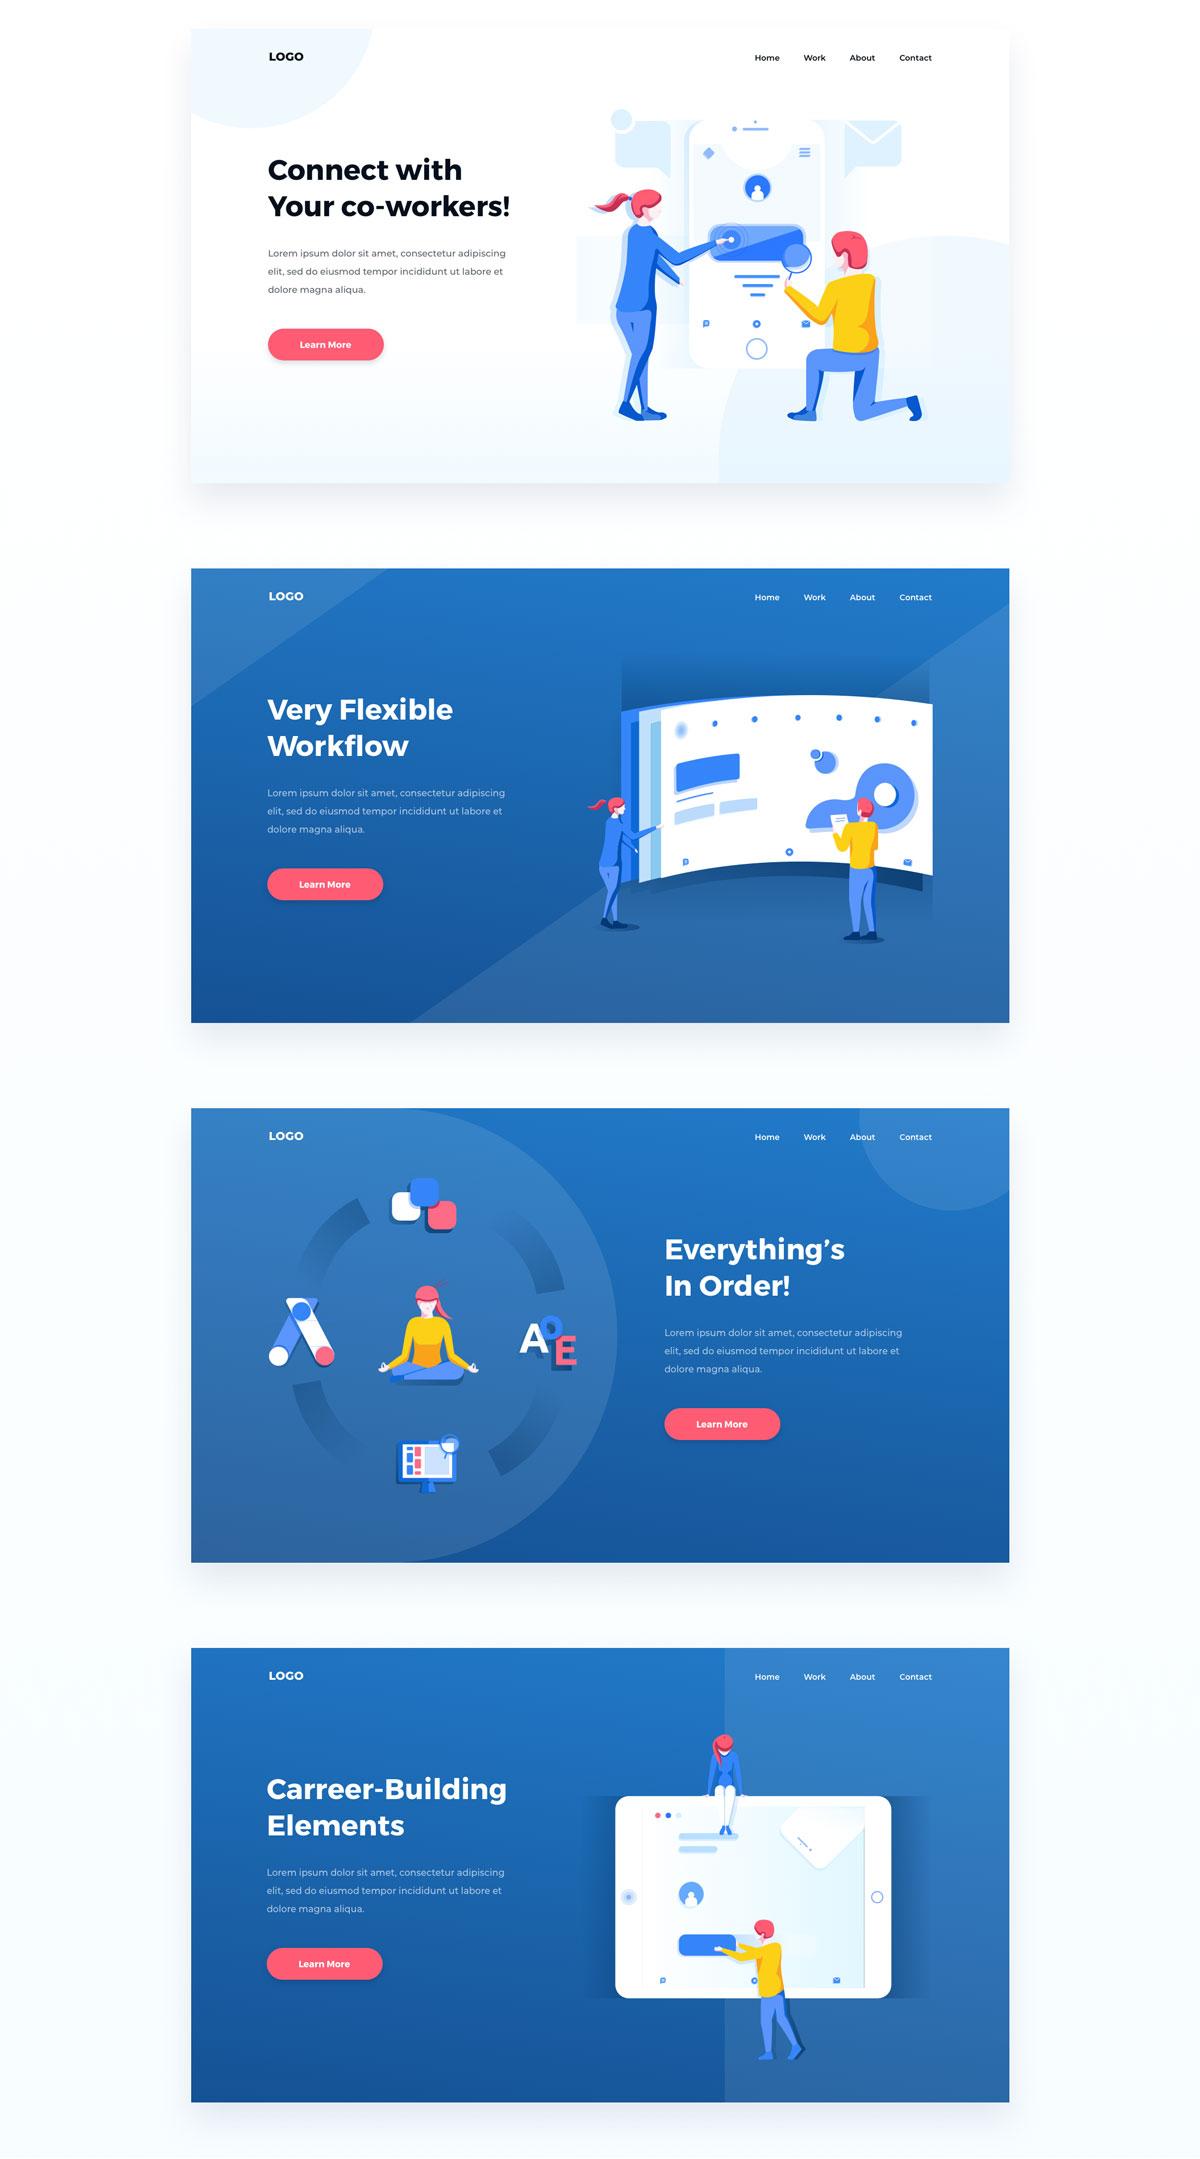 精心设计的团队合作和协作EPS矢量插图 Teamwork & Collaboration Illustrations插图(17)